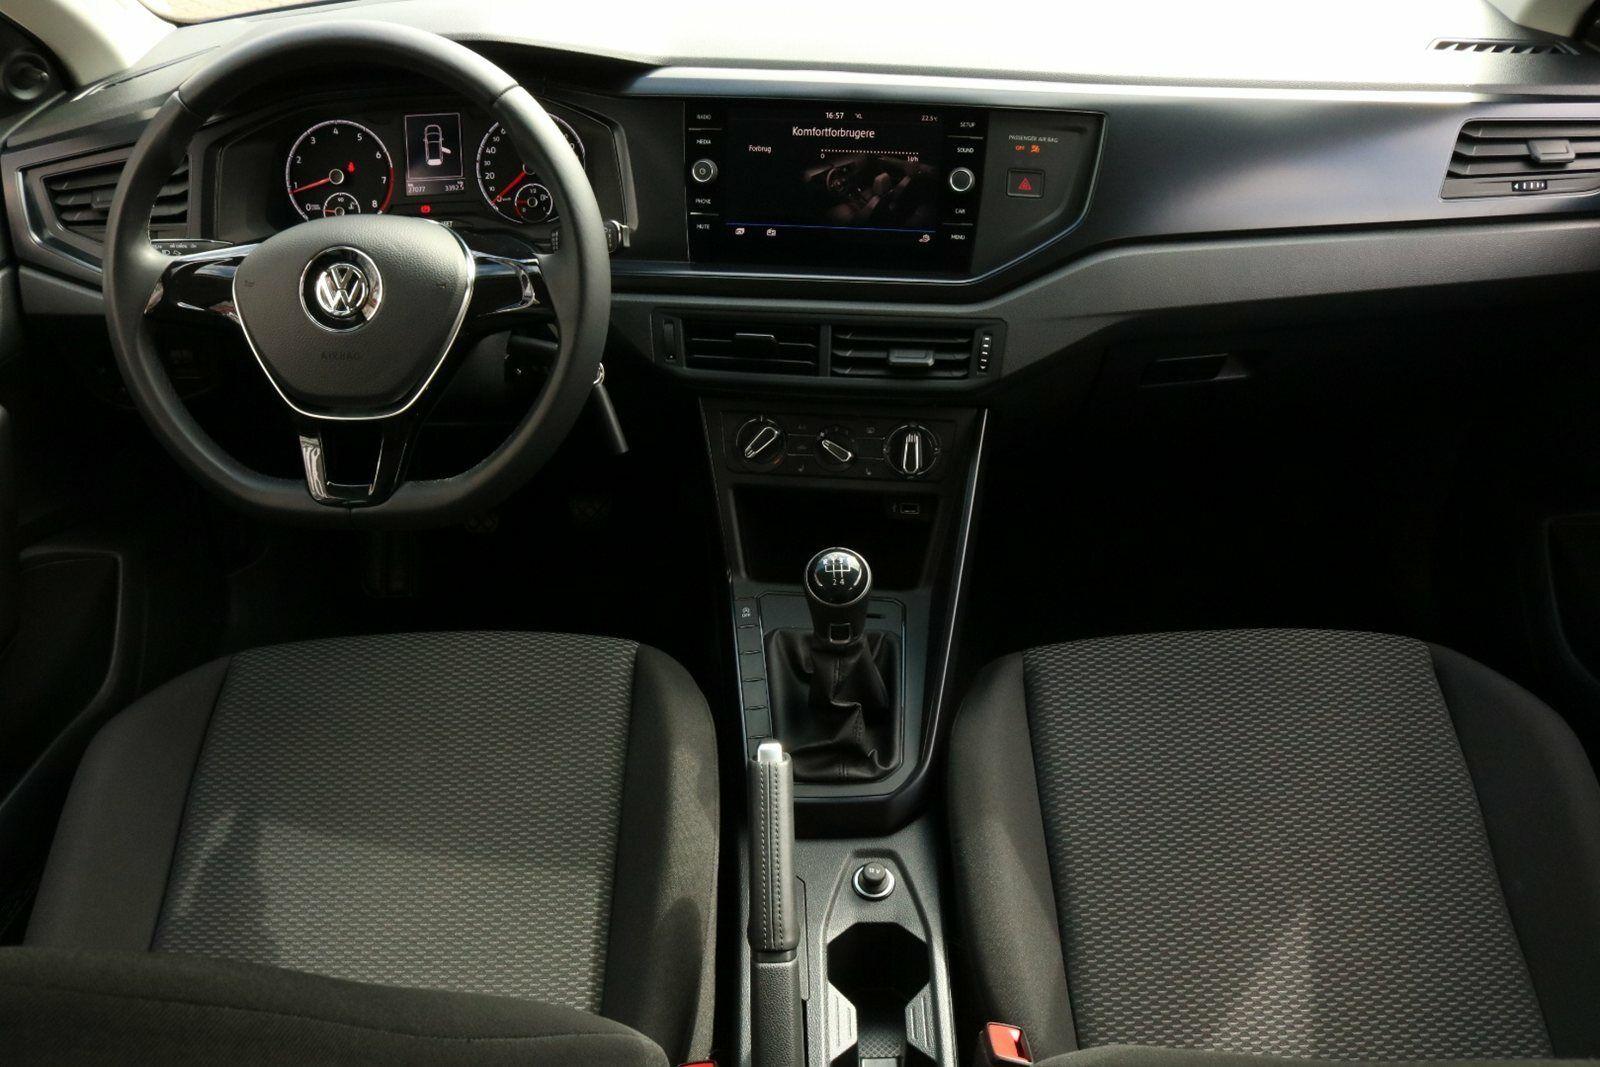 VW Polo MPi 75 Trendline